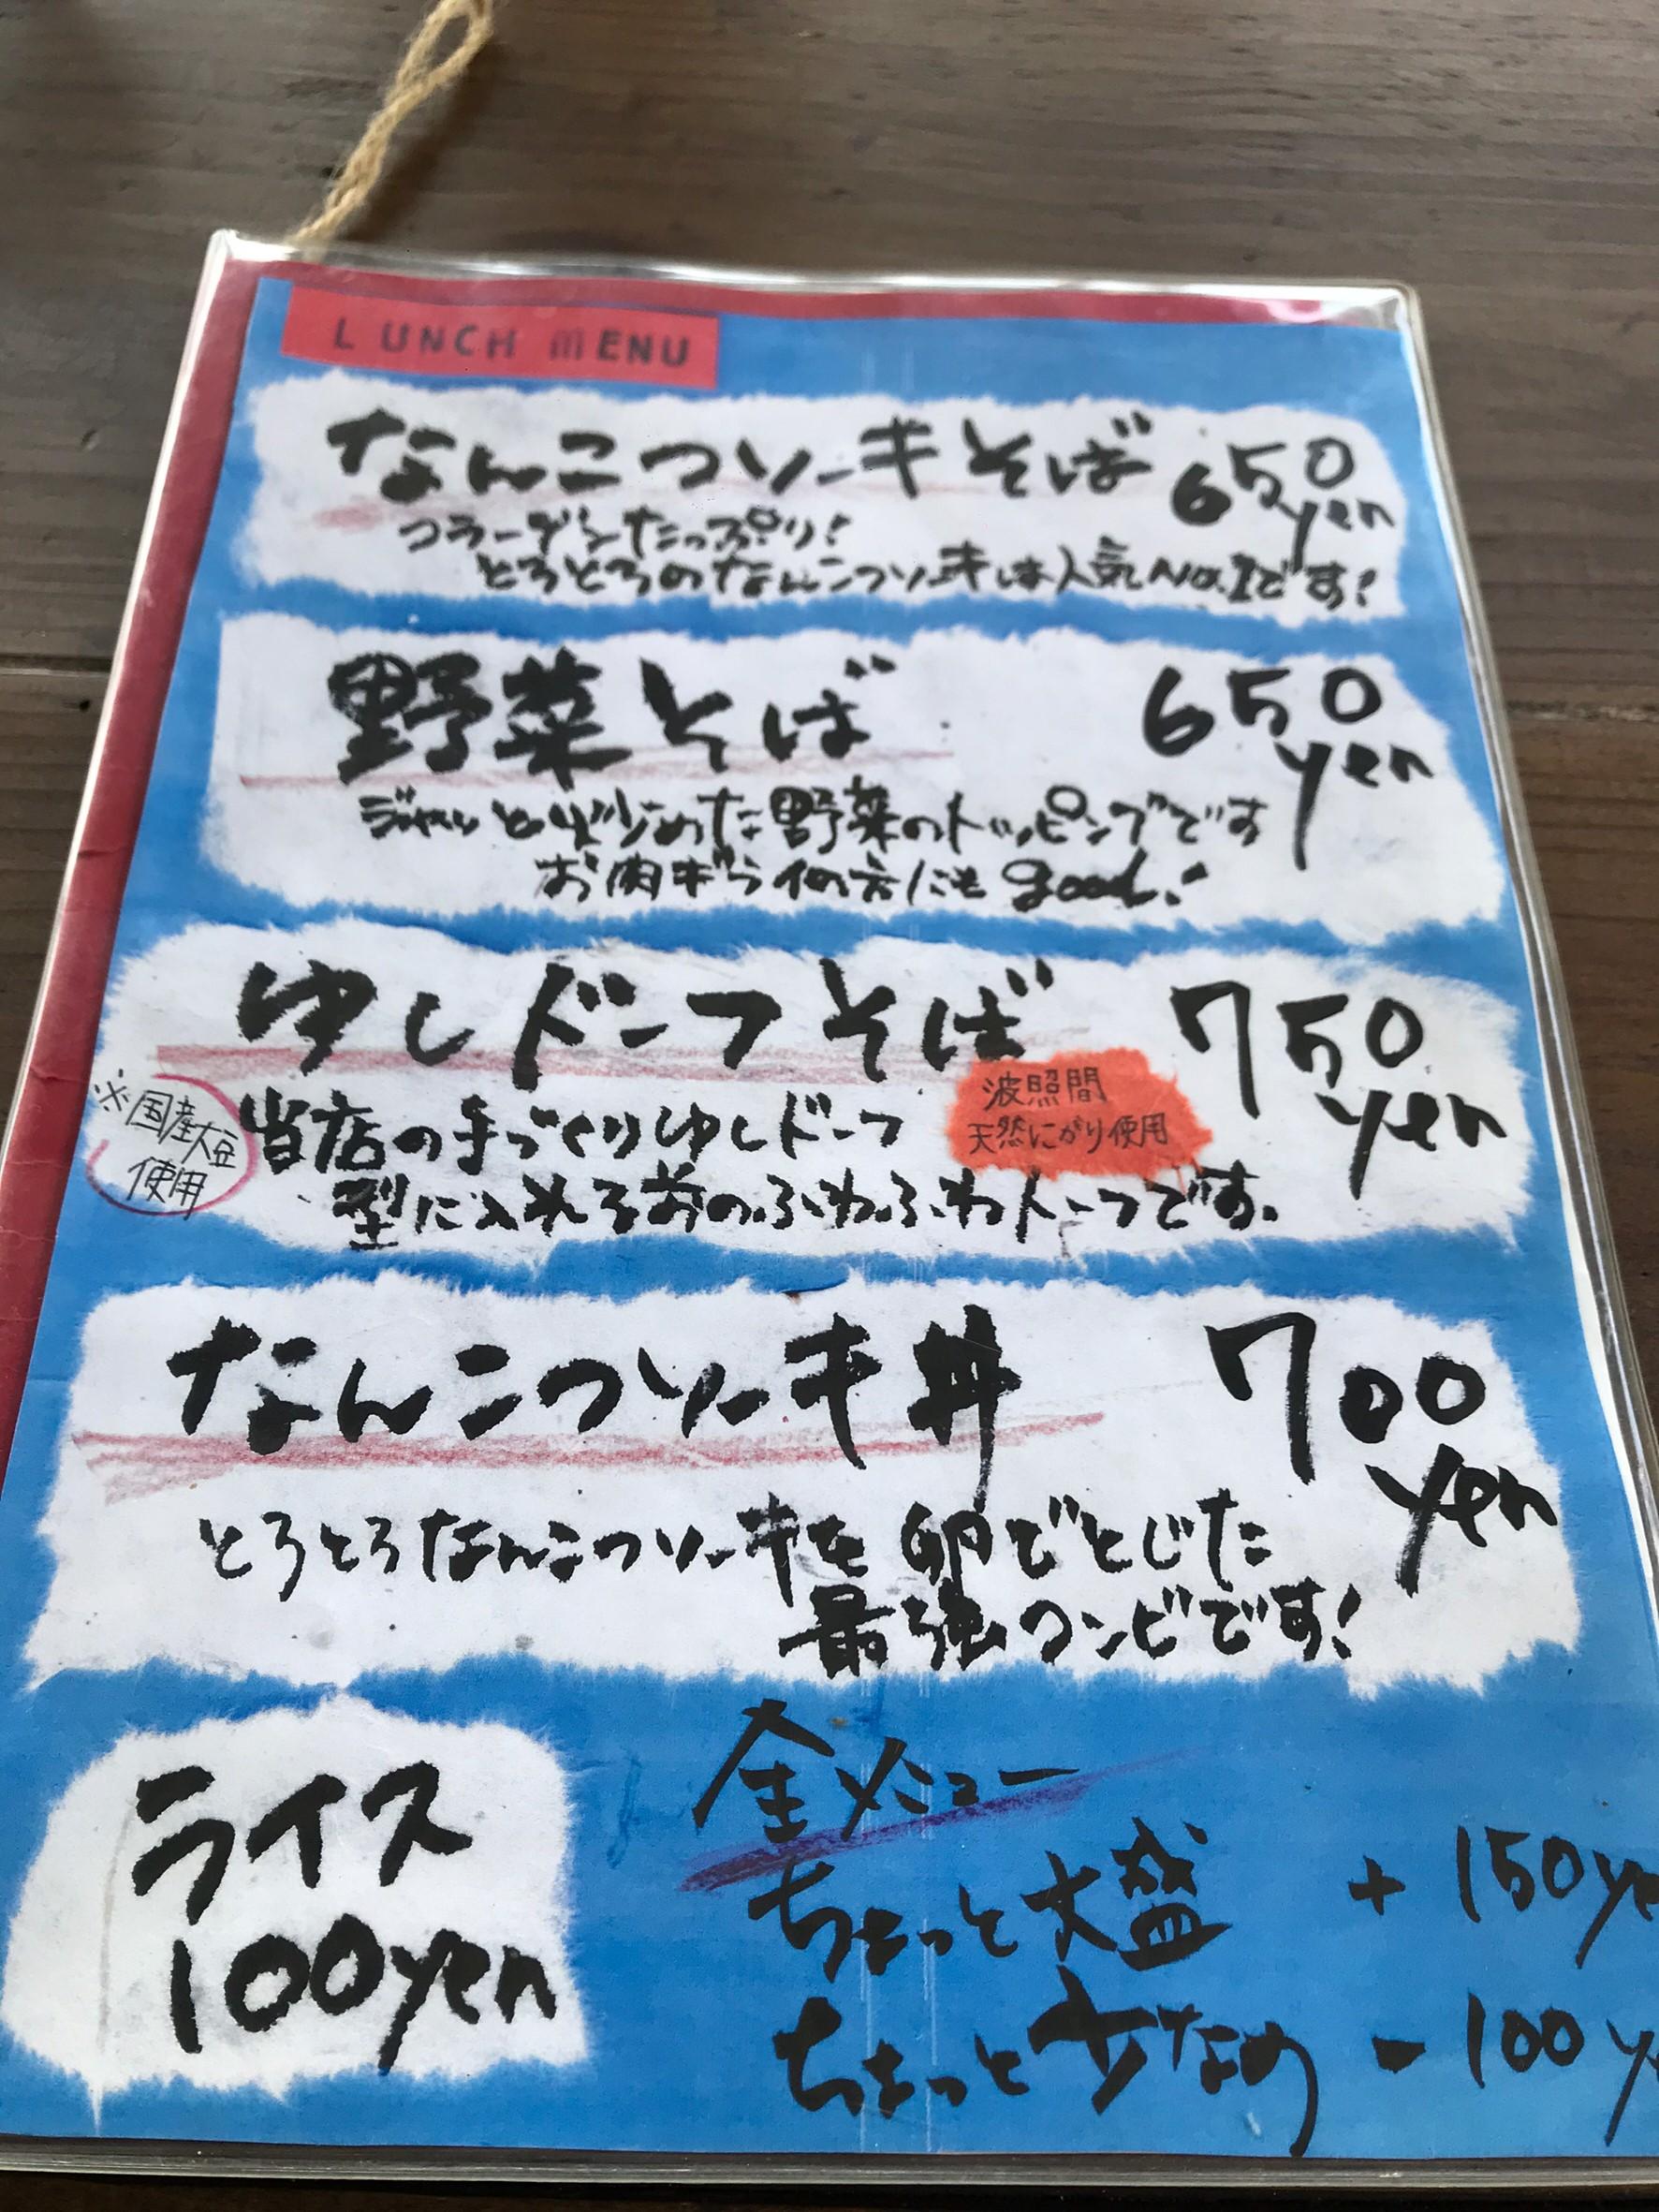 Soba cafe Atofusoko menu